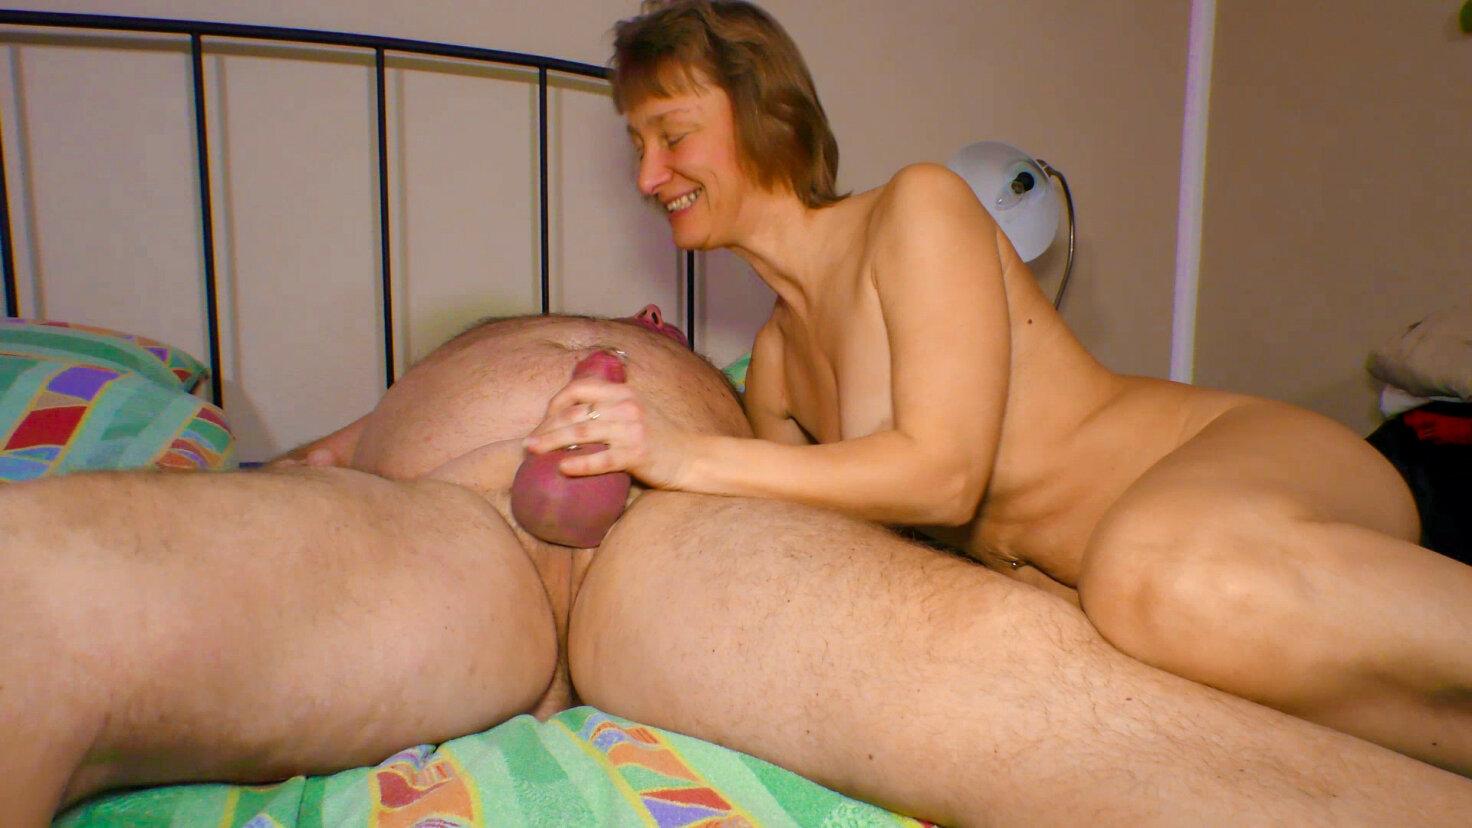 Slutty German granny Manuela H. loves the taste of fresh cum